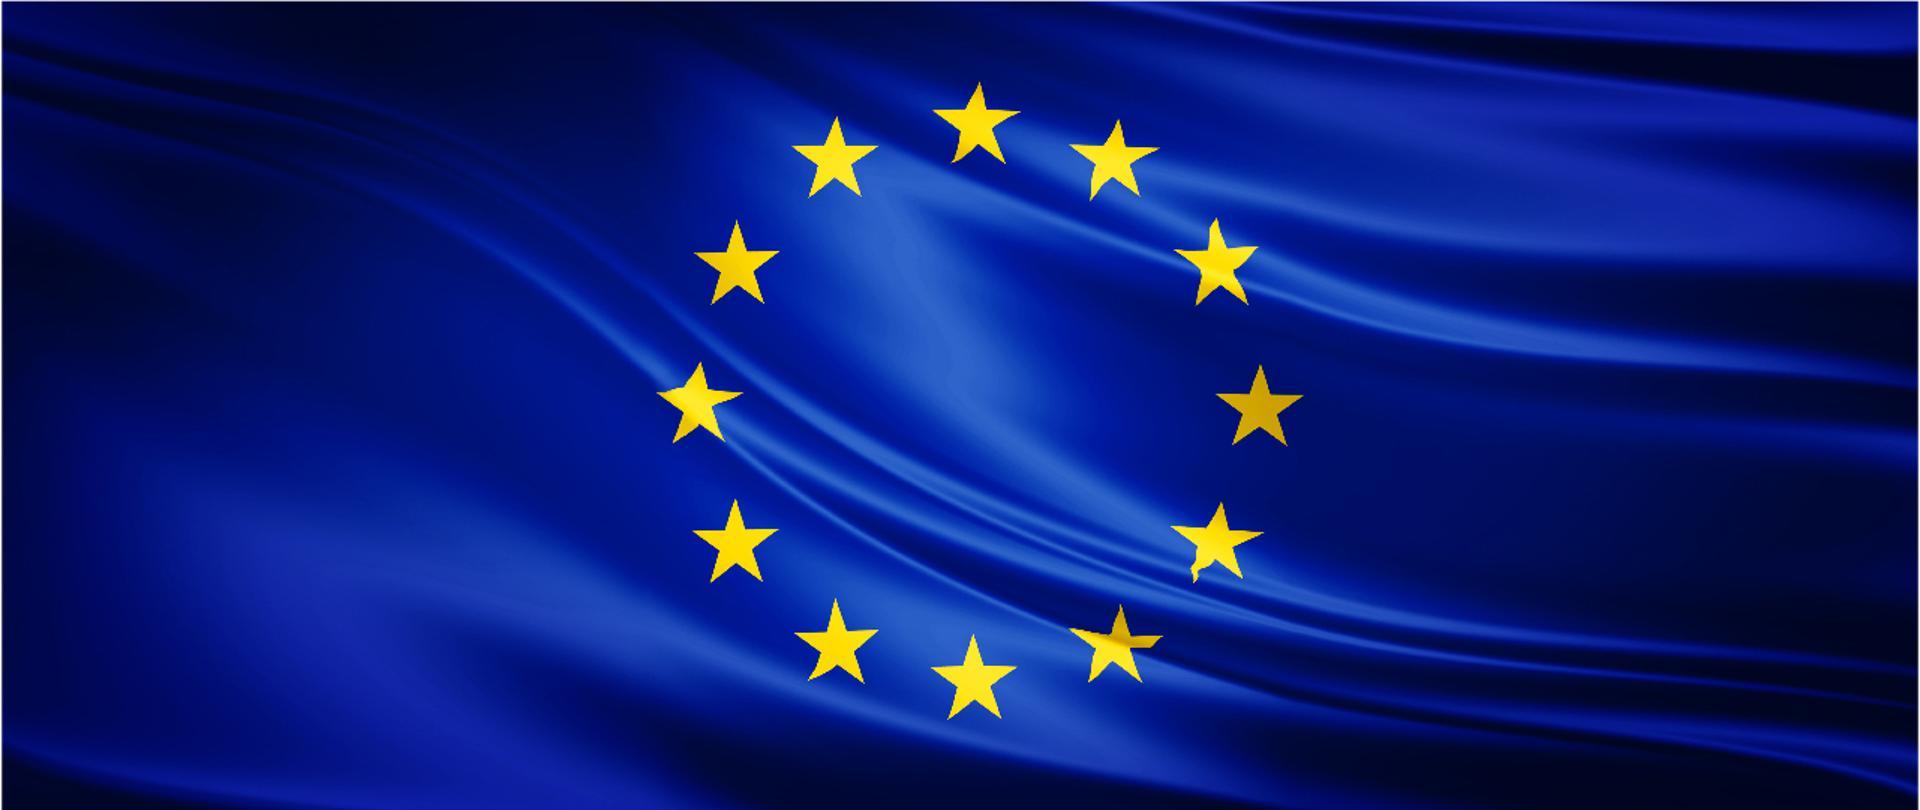 Przetarg na rejestratora domen .eu